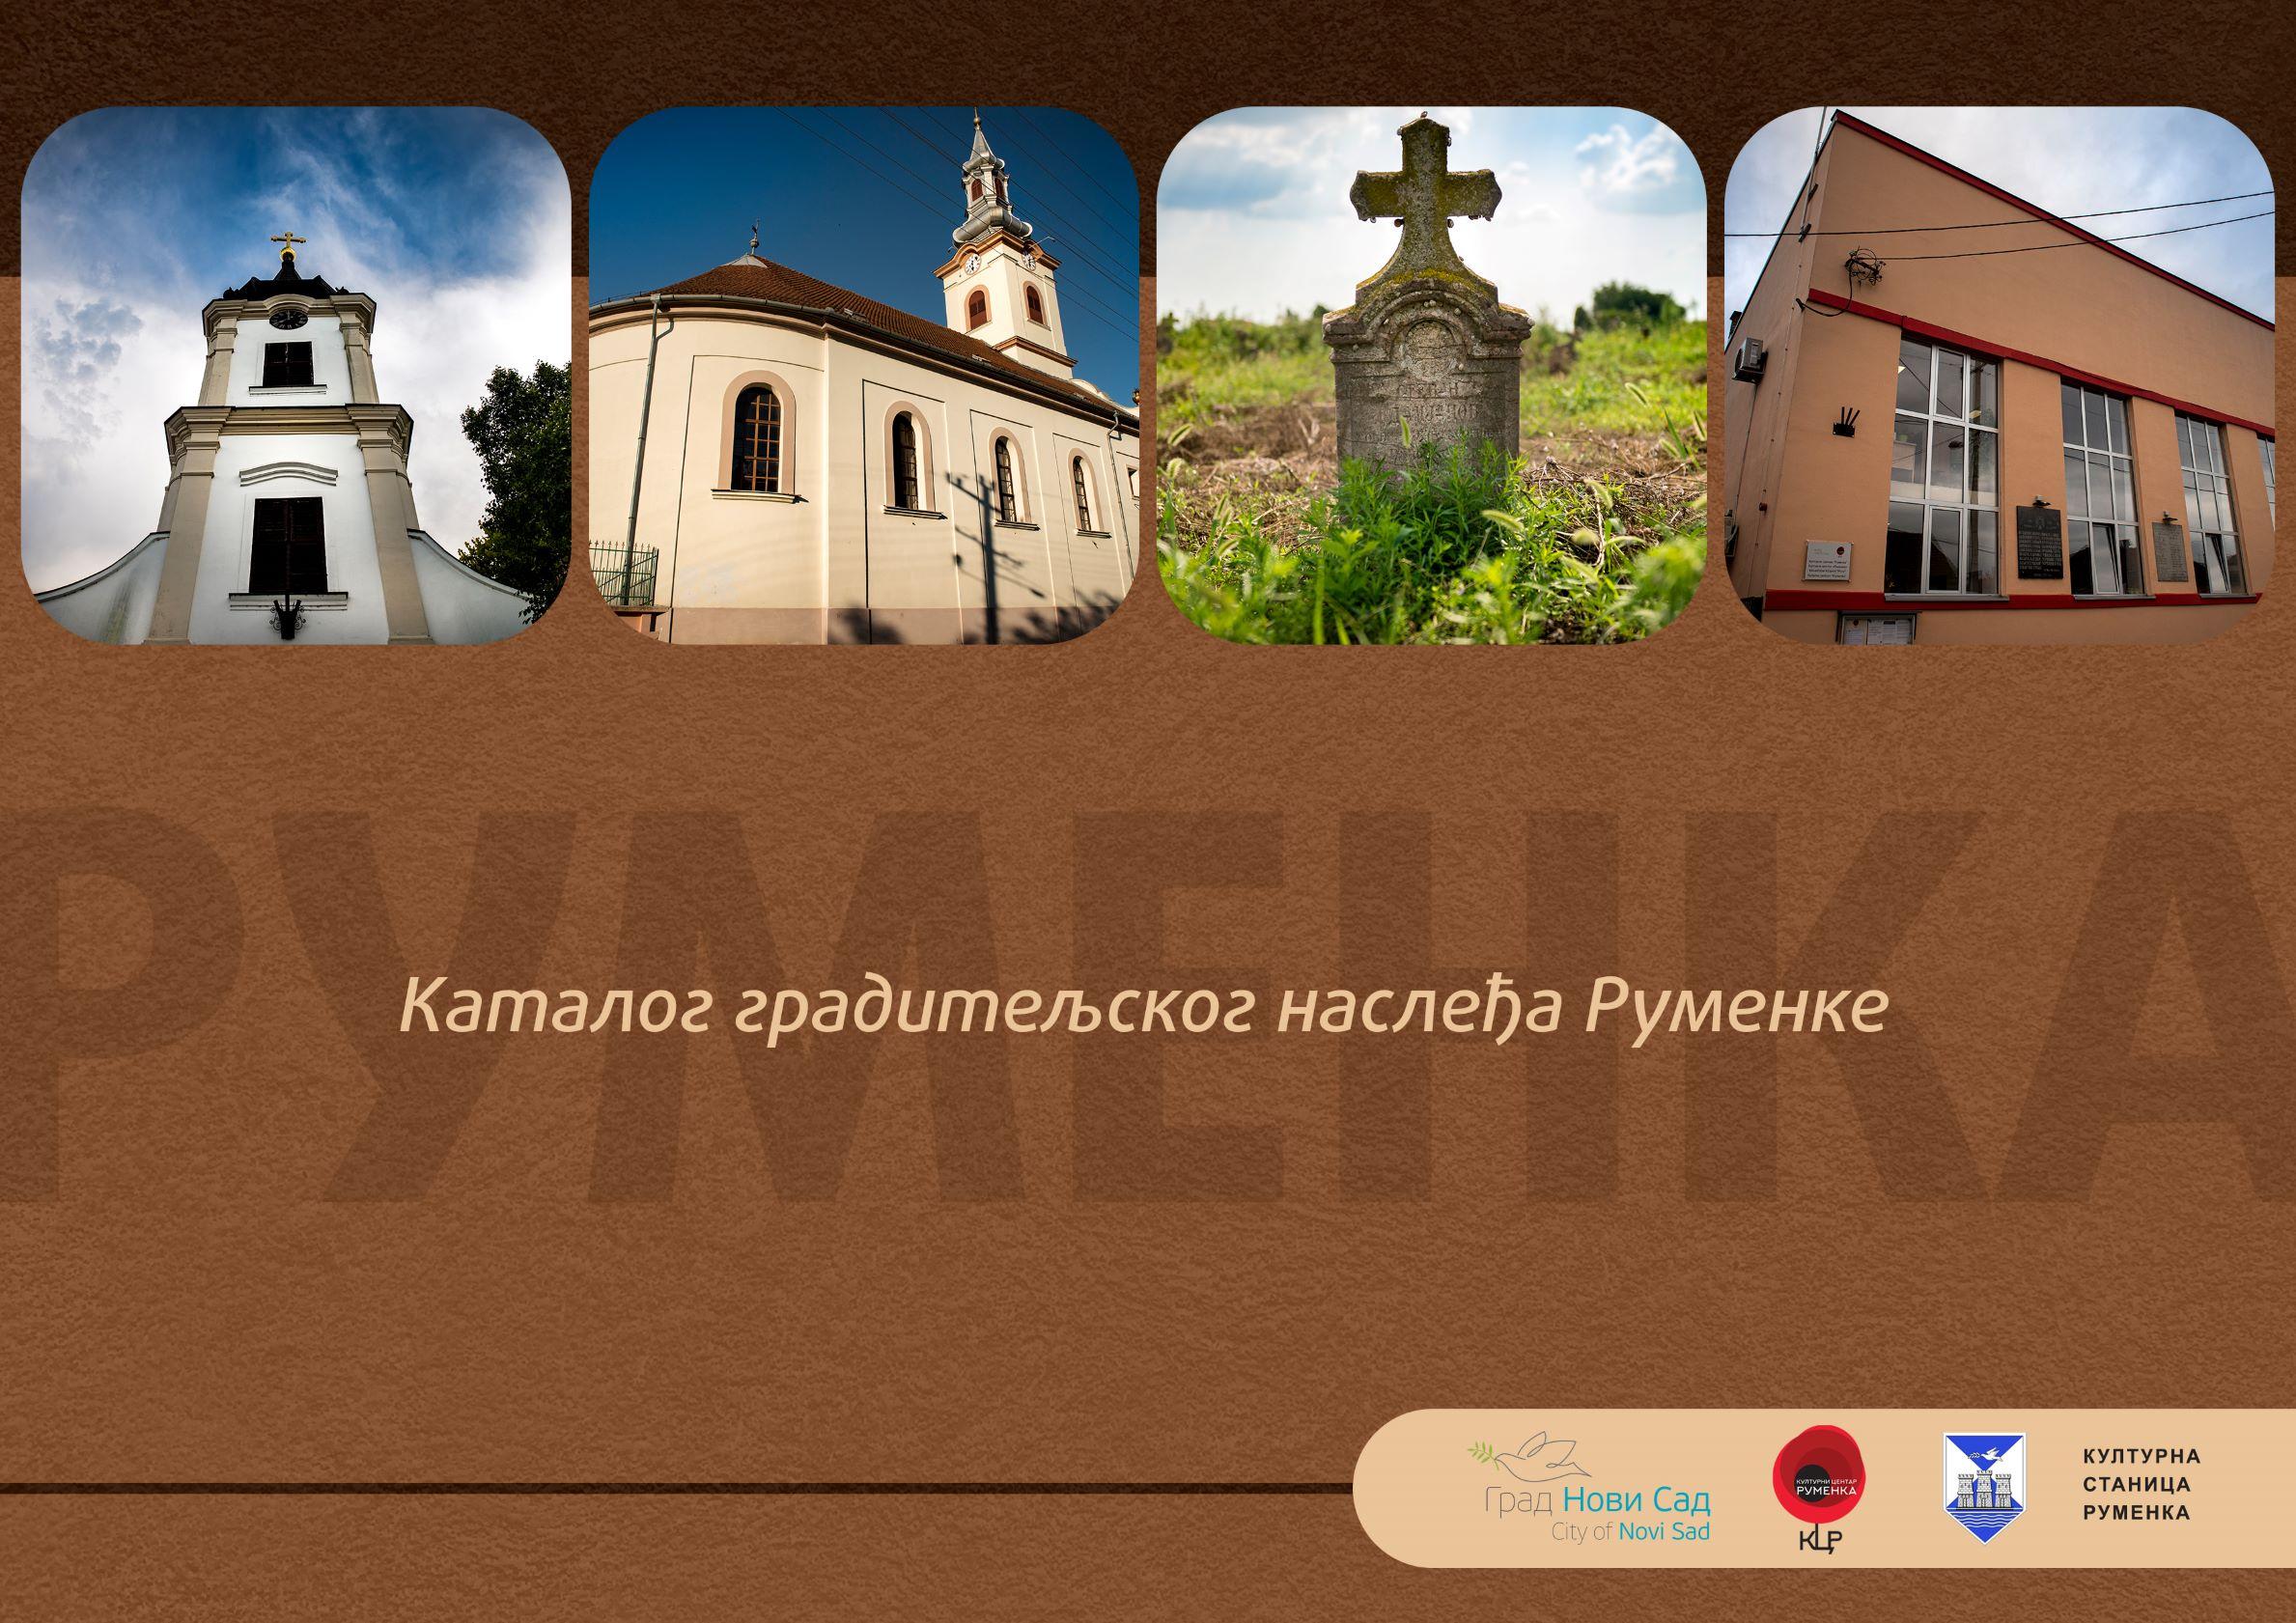 Katalog graditeljskog nasleđa Rumenke The Catalogue of Construction Heritage of Rumenka